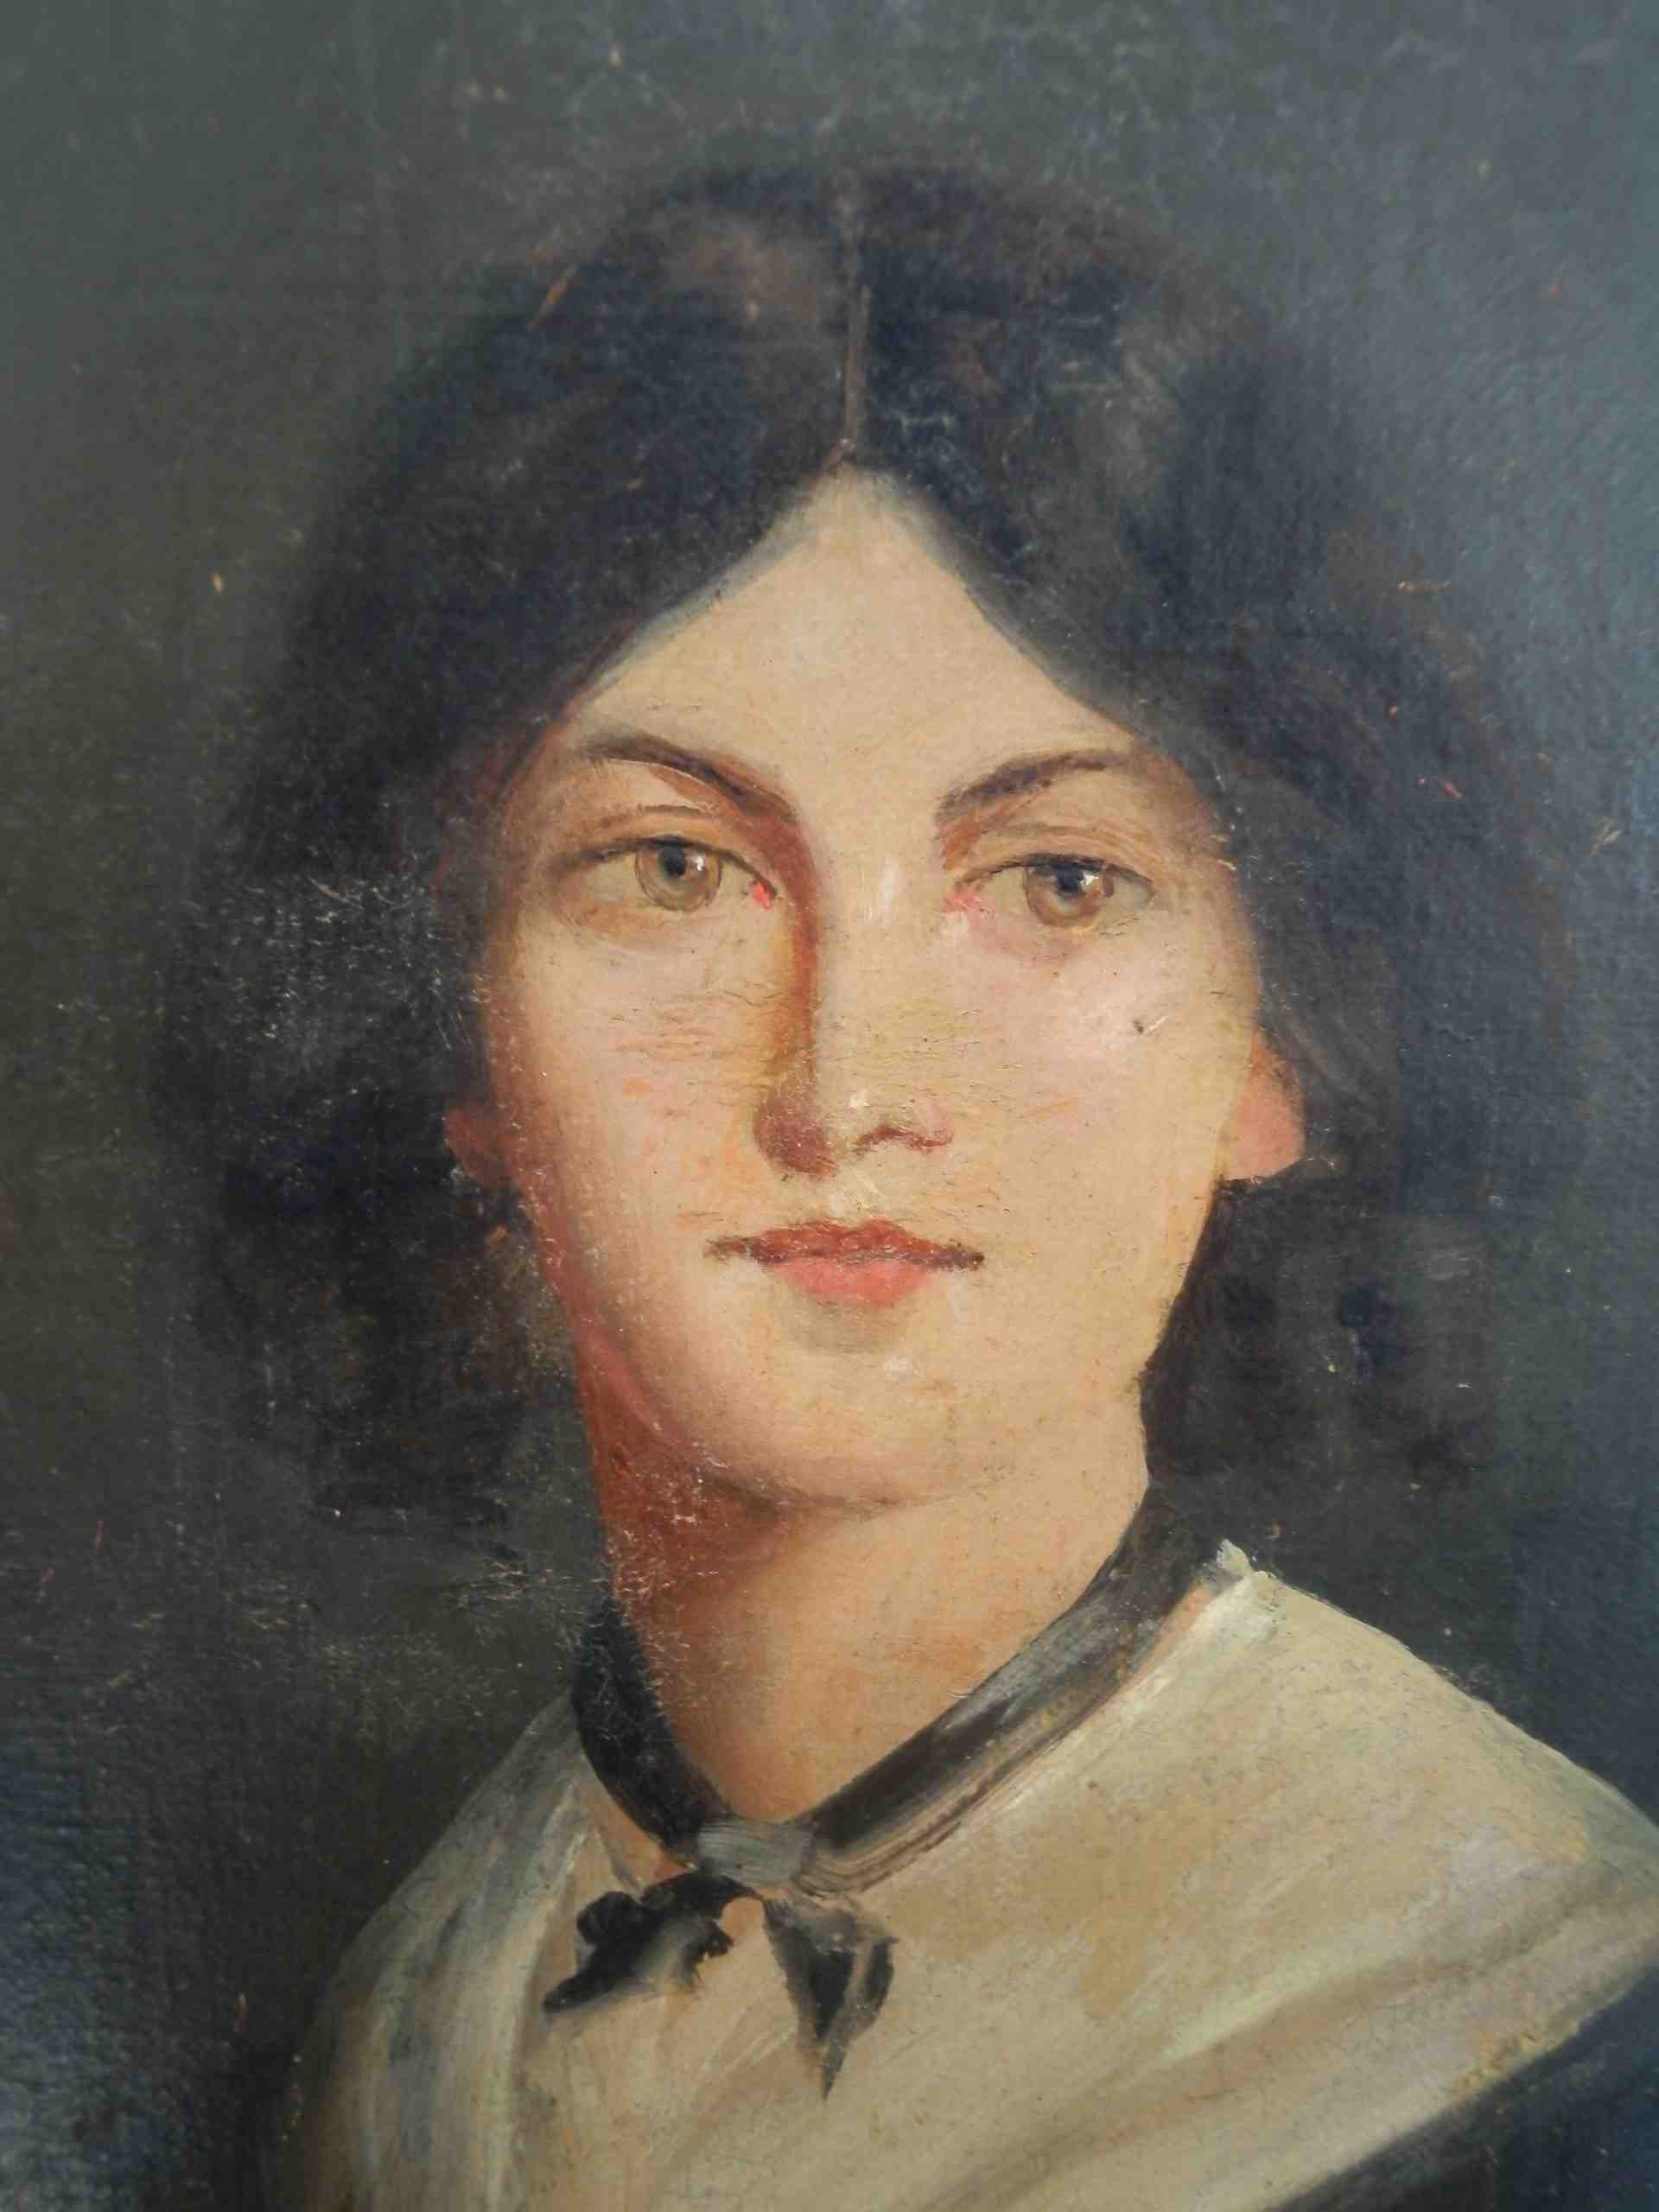 Emily Bronte photo #3669, Emily Bronte image